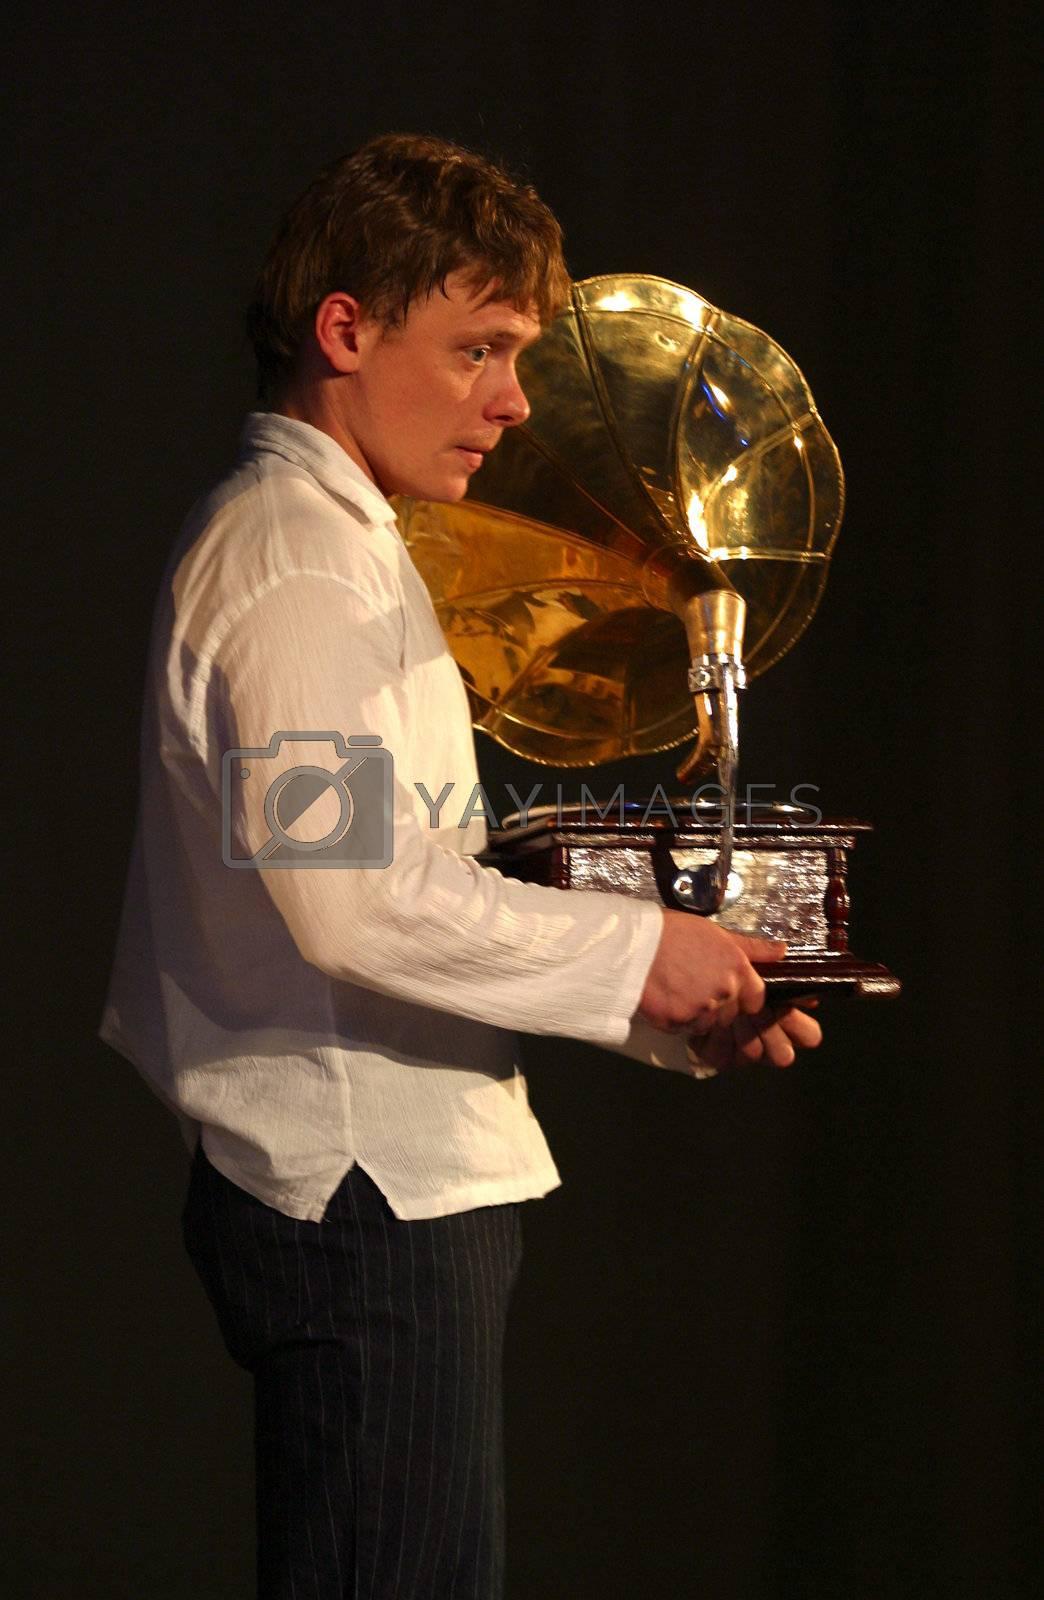 Paul Majkov in performance `Display of love`